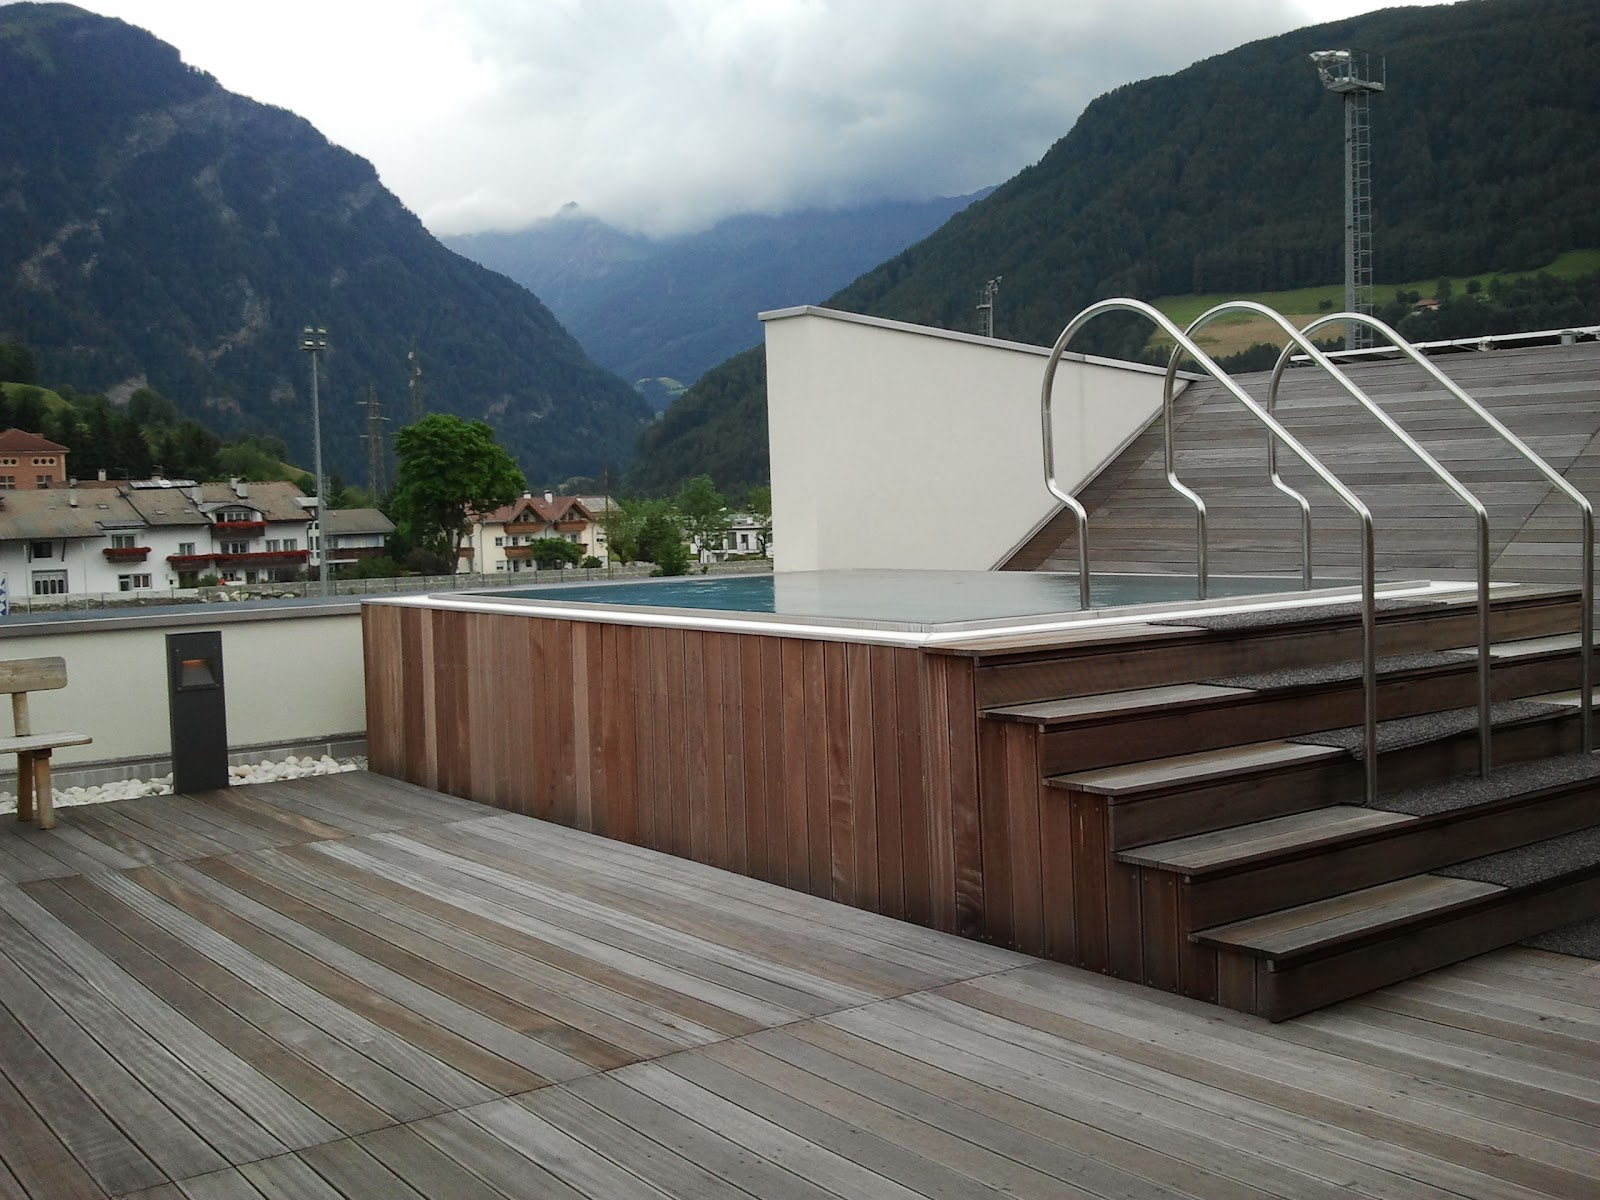 Wellness e dintorni informazioni opinioni esperienze for Asciugacapelli a parete per piscine